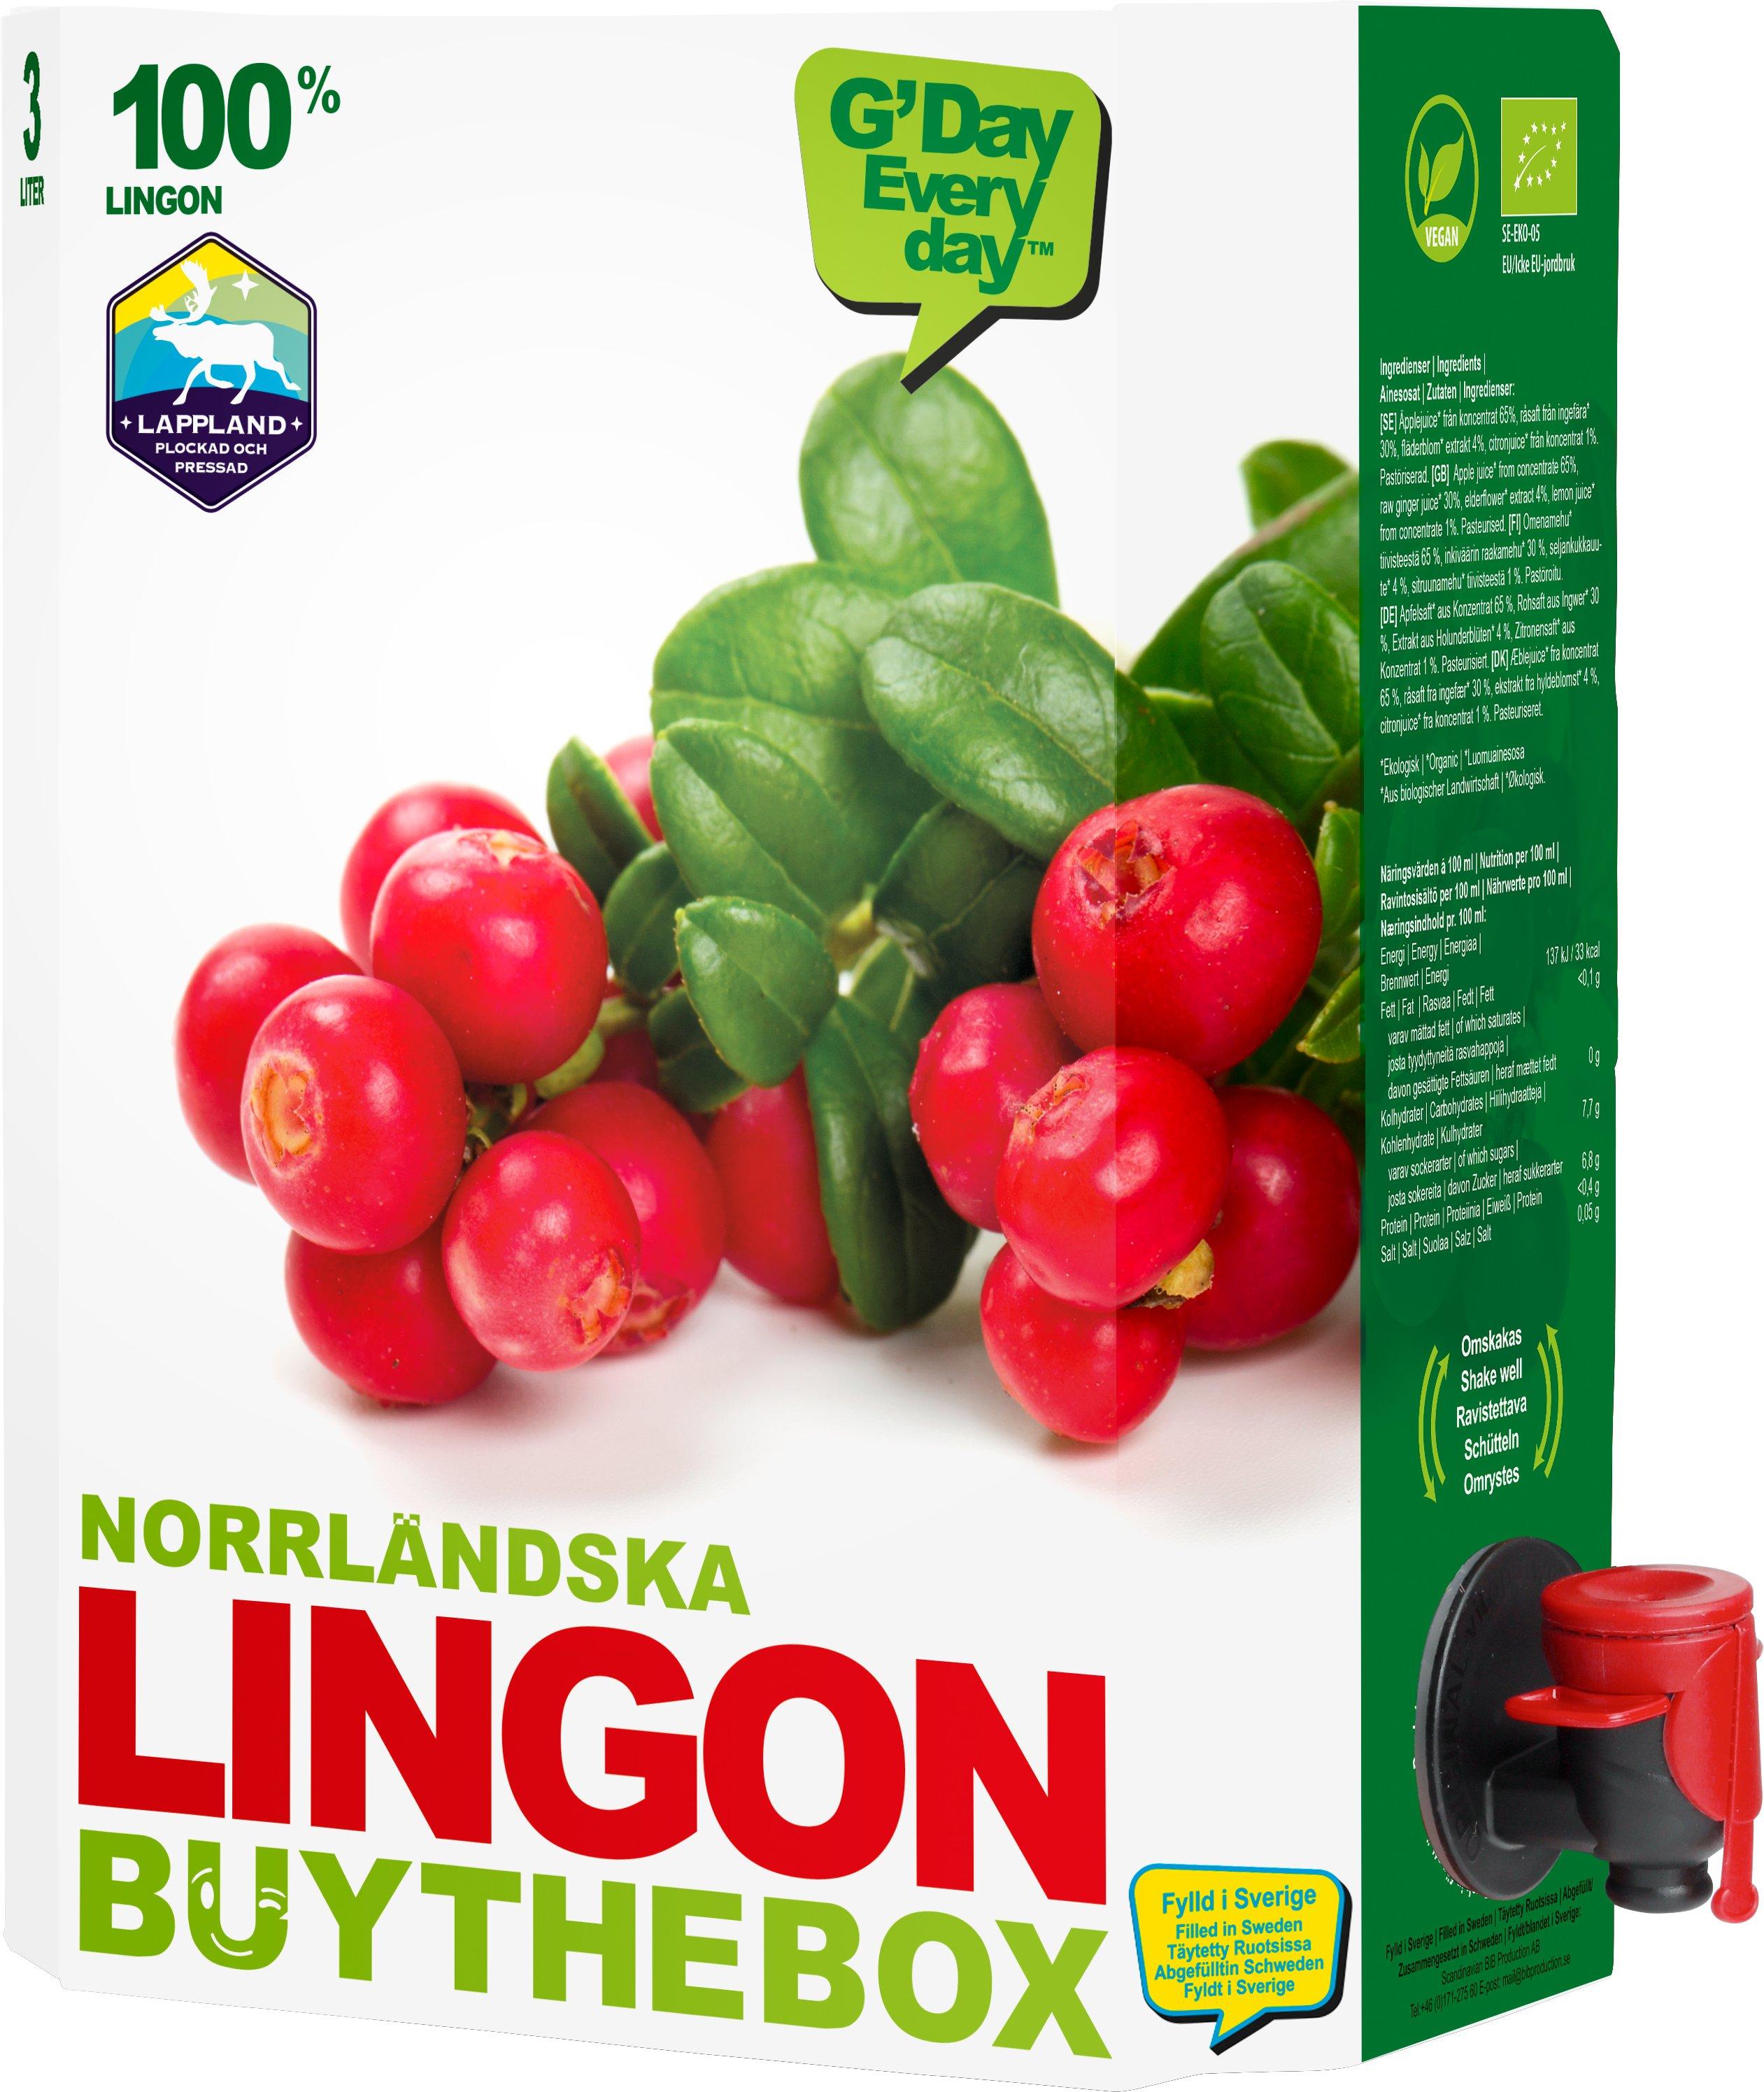 Norrländsk Lingonjuice - 24% rabatt